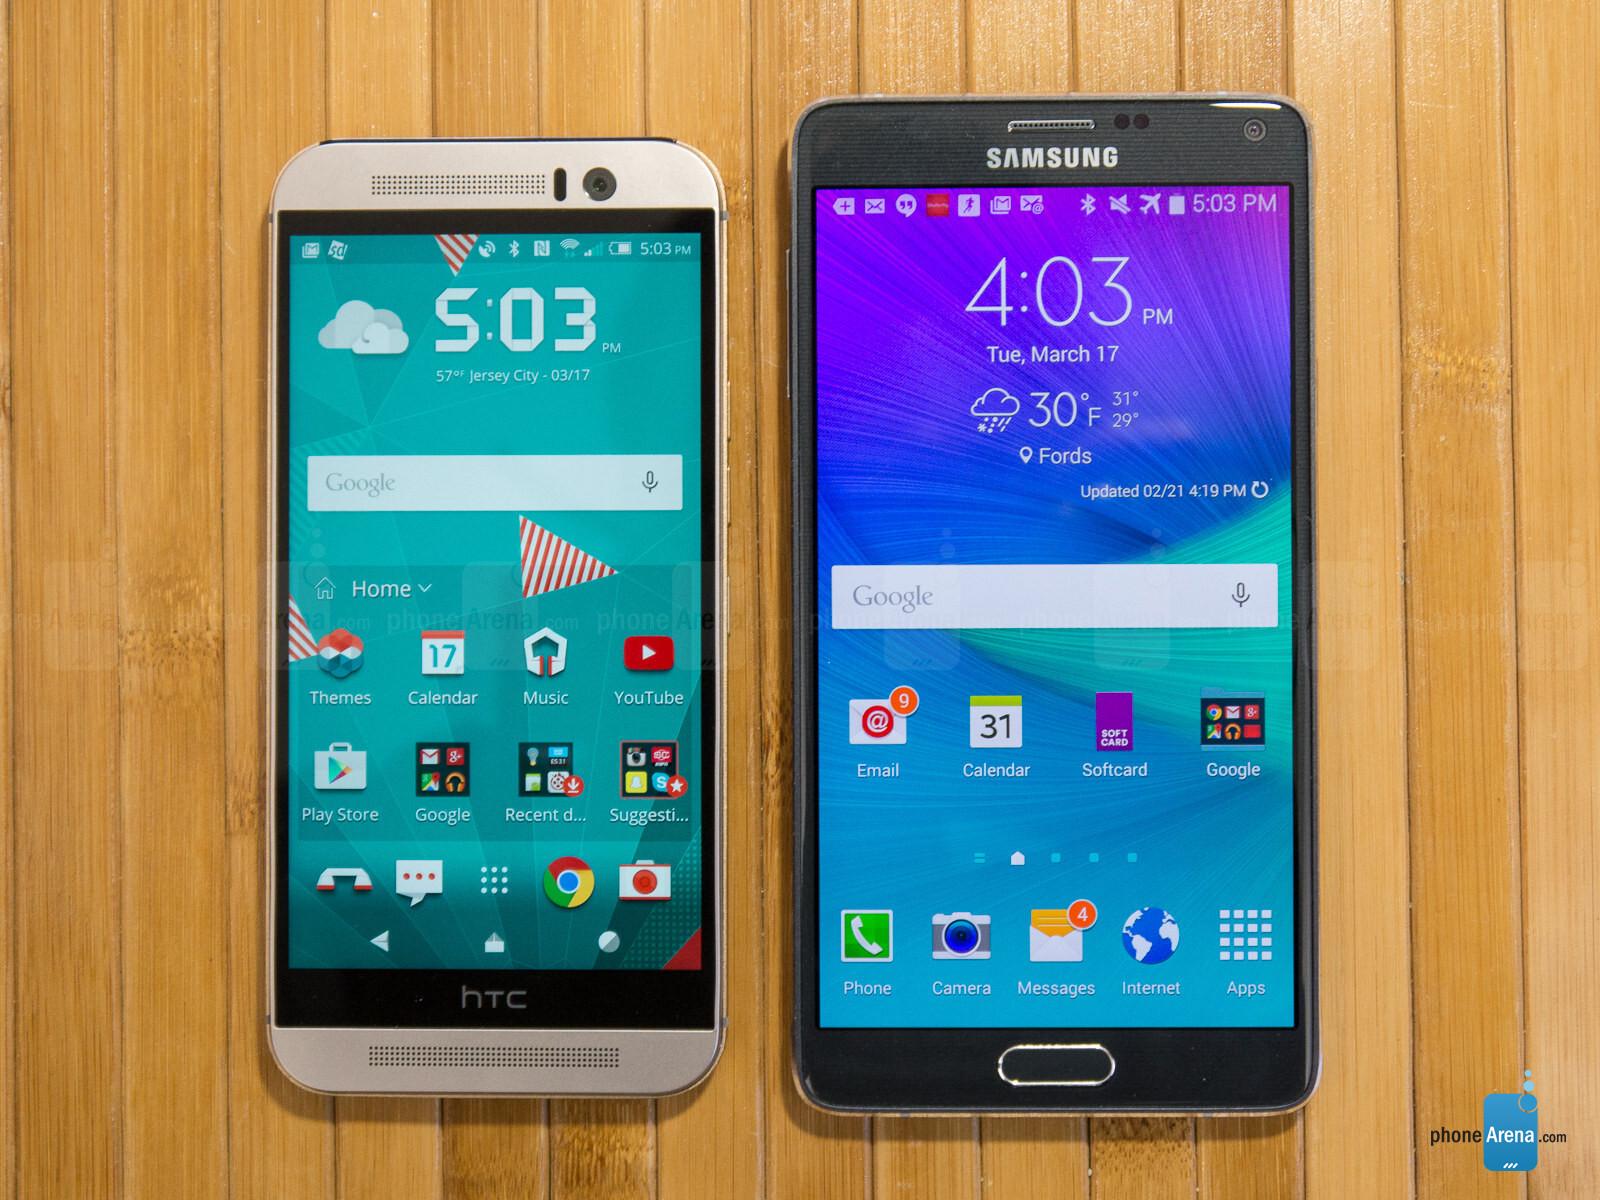 Samsung galaxy note 5 vs htc one m9 plus a comparison - Htc One M9 Vs Samsung Galaxy Note 4